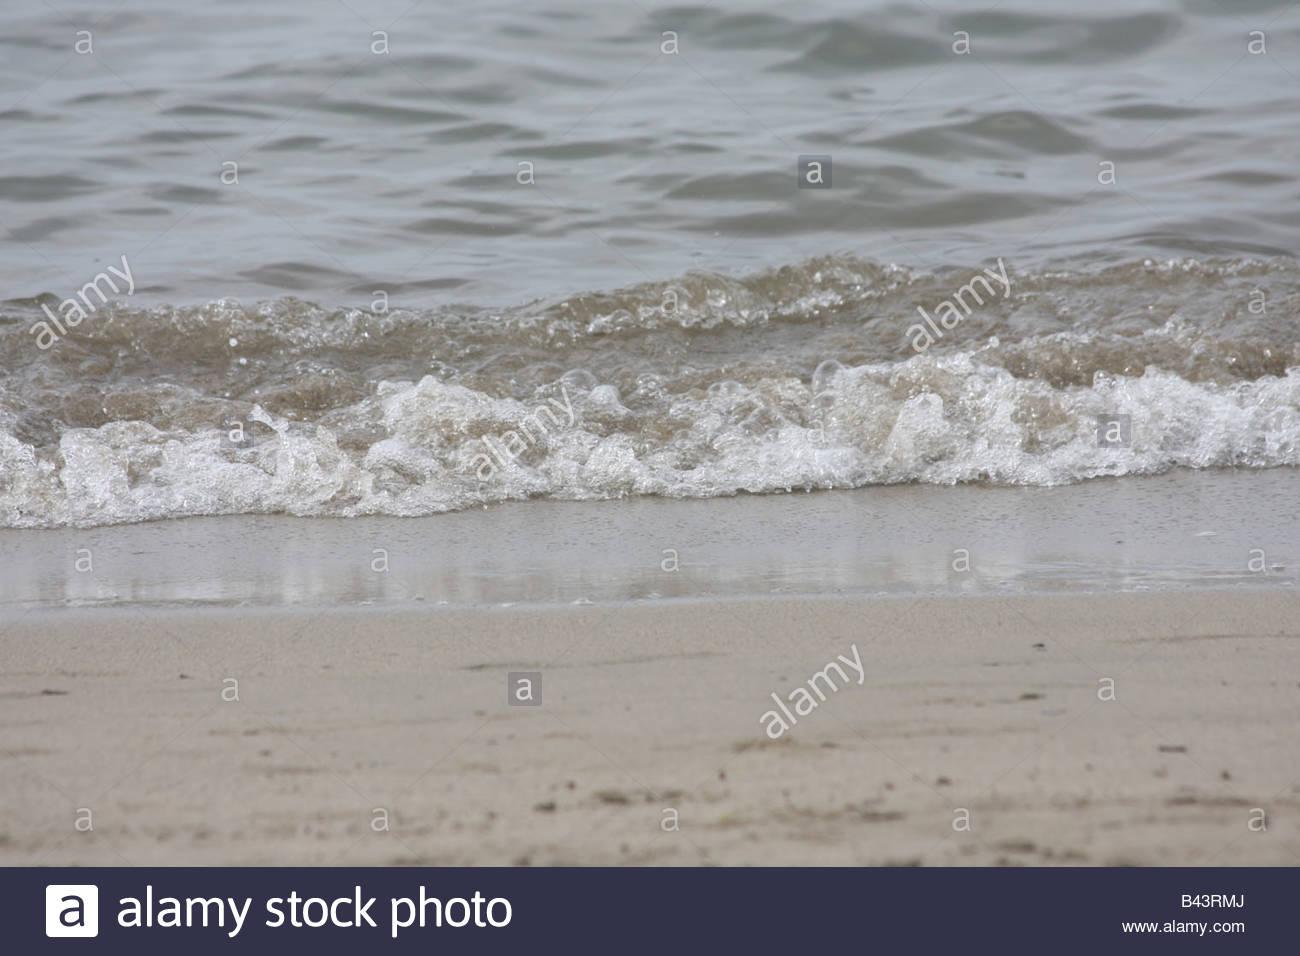 Gentle waves of the Mediterranean sea. - Stock Image